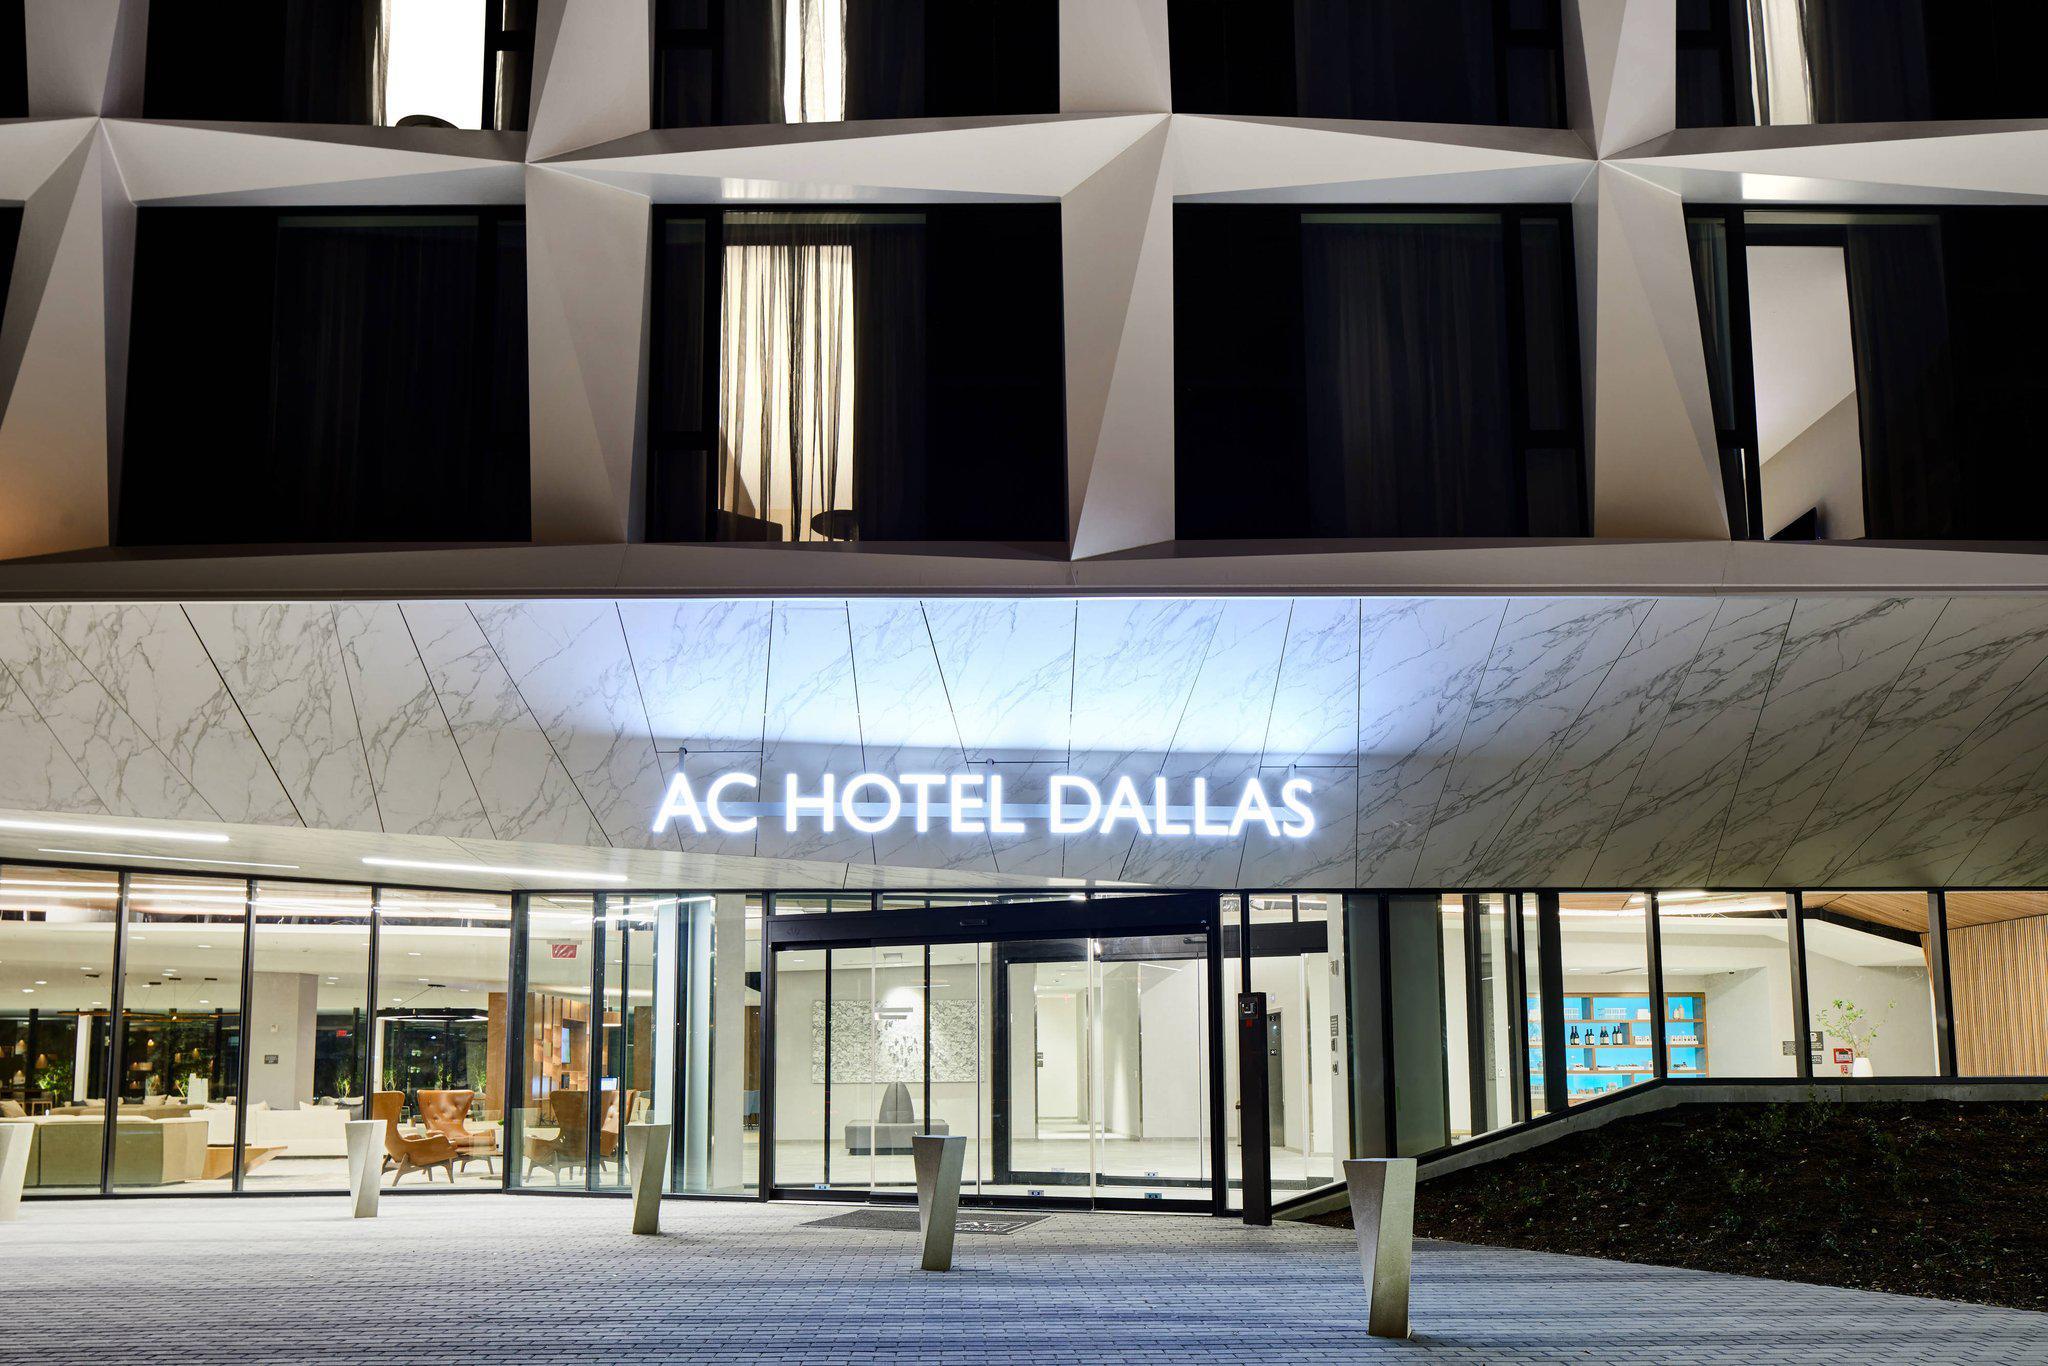 AC Hotel by Marriott Dallas by the Galleria